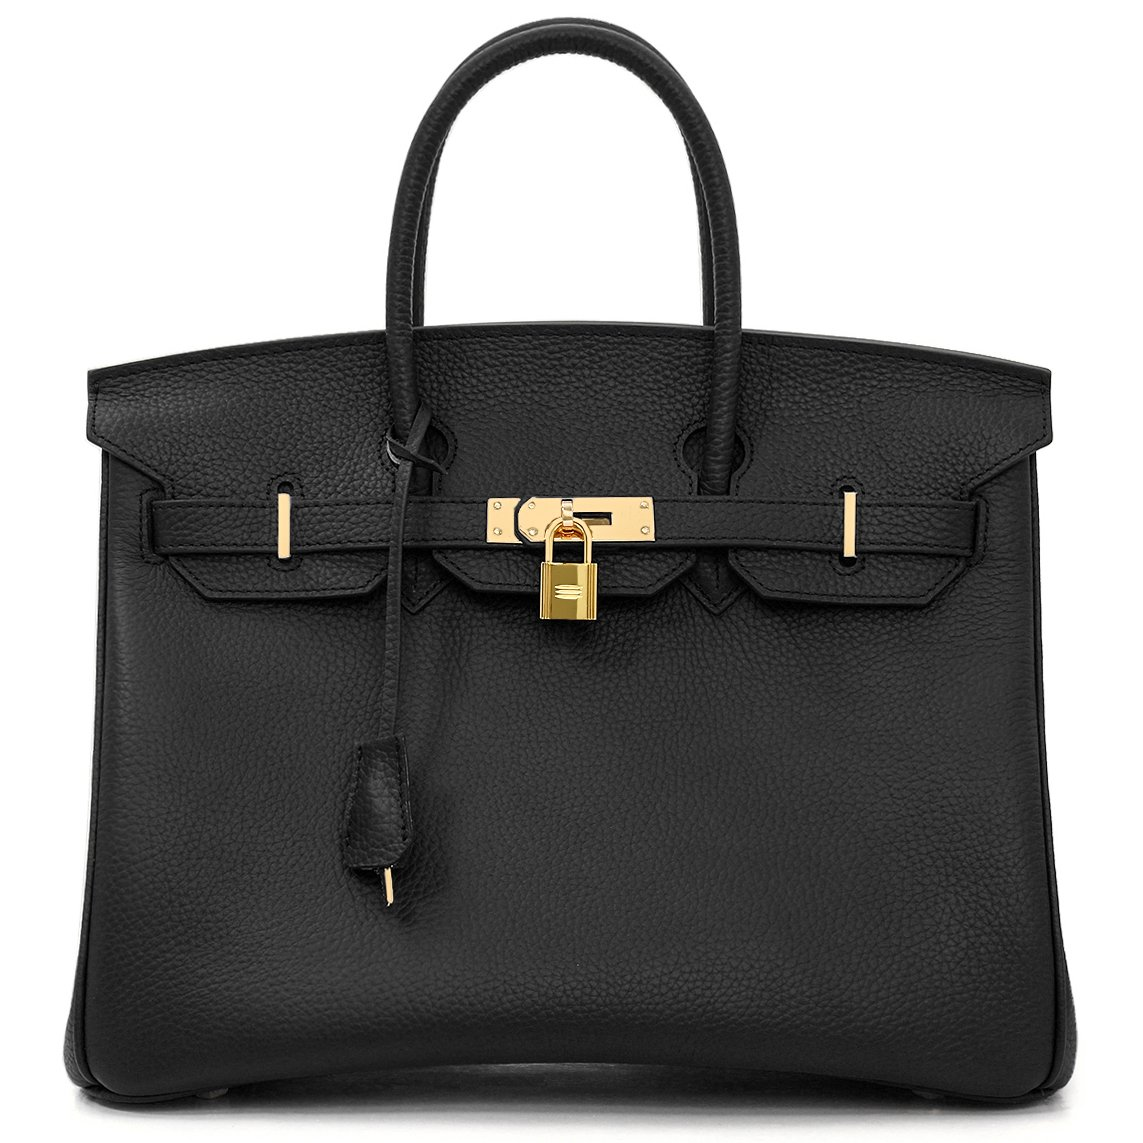 Macton European and American Classic Padlock Genuine Leather Top Handle Handbags Mc-1329 (11.8'', Black)